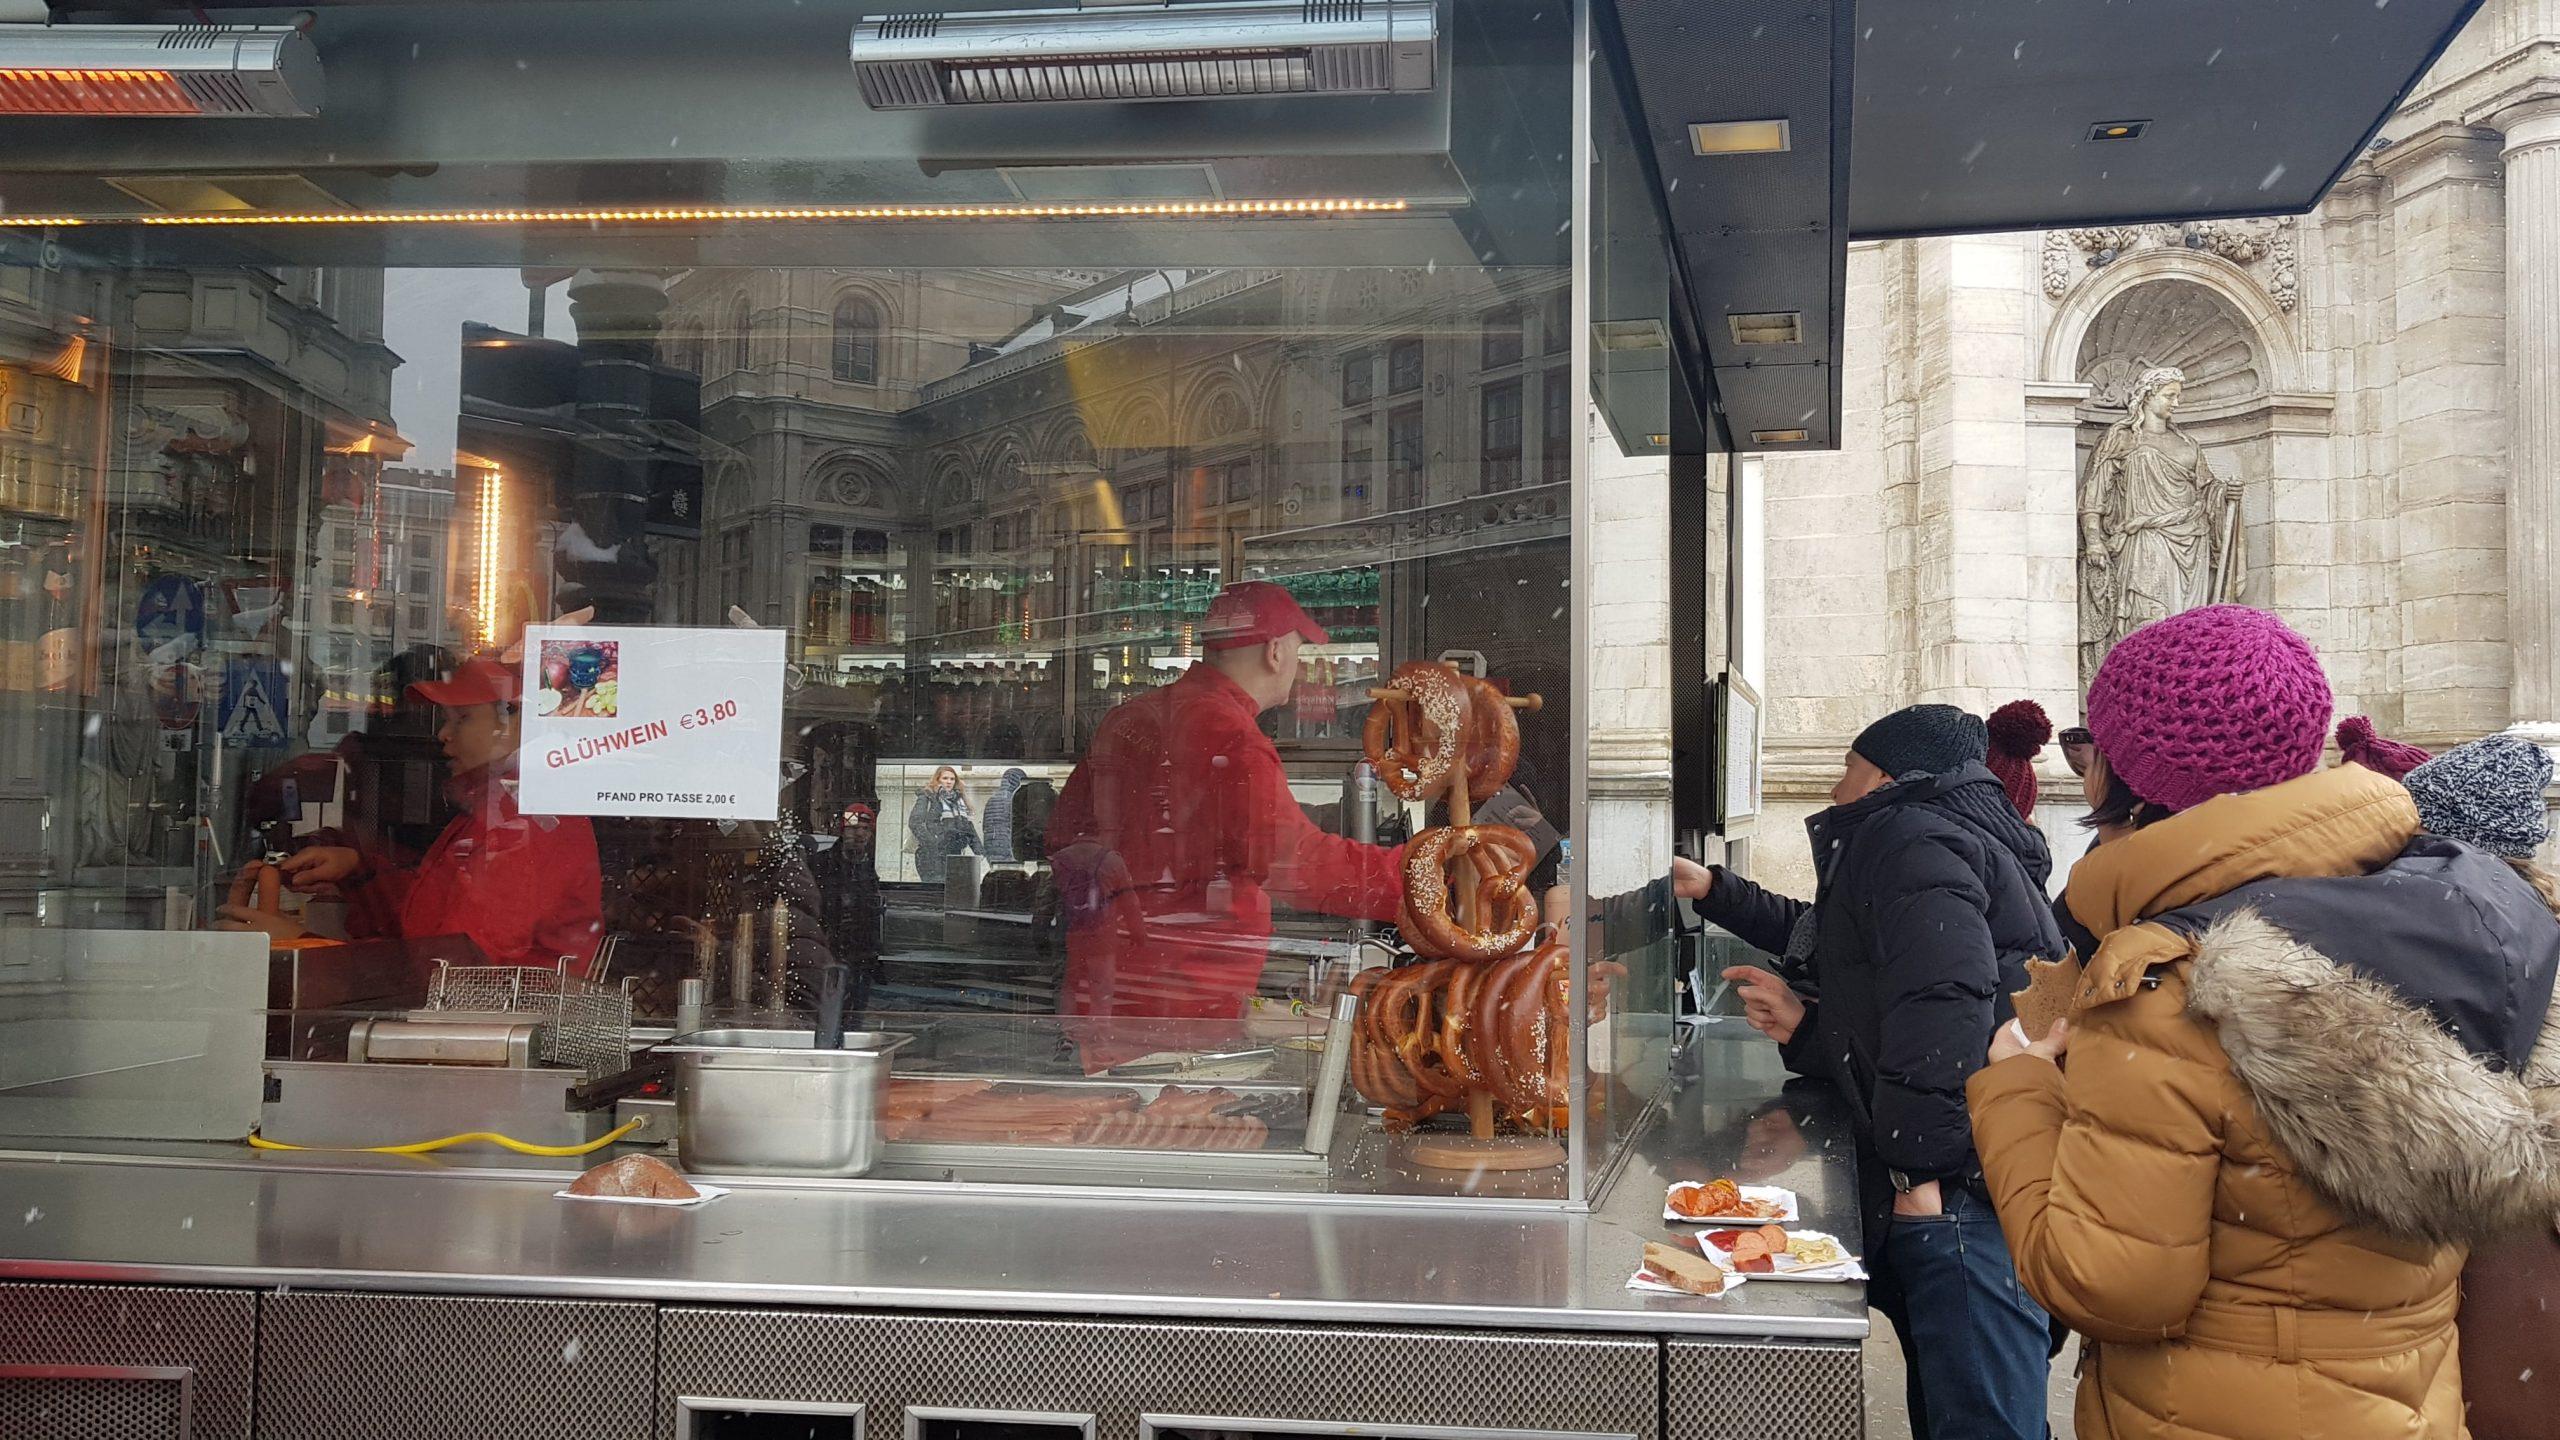 Puesto Bitzinger, Bretzels en las calles de Viena